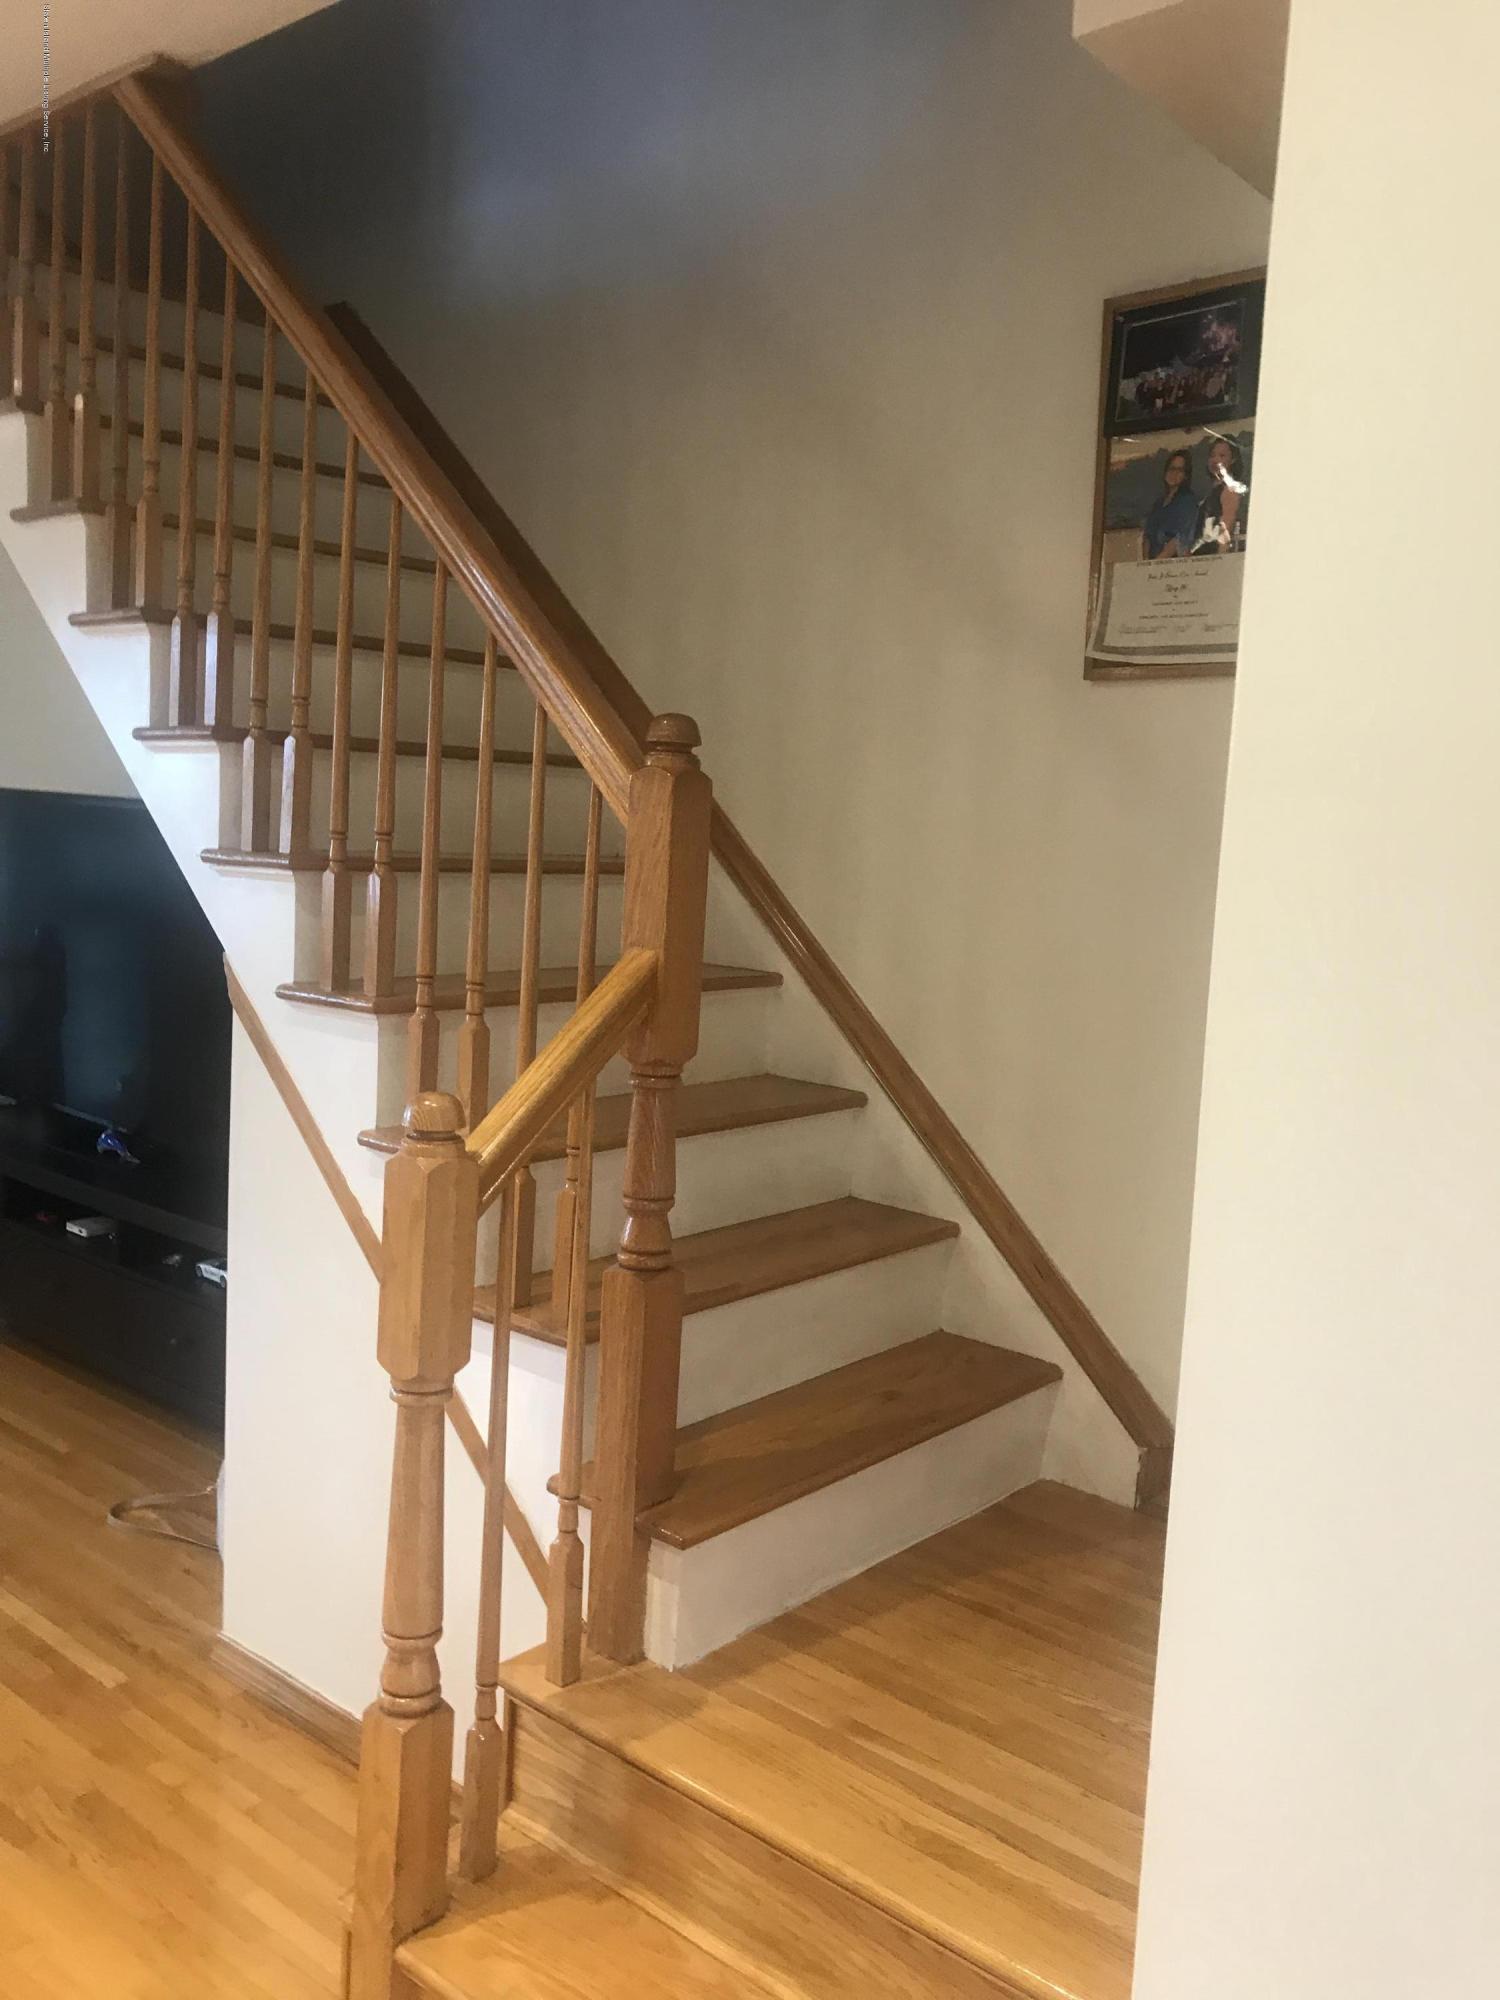 Single Family - Attached 58 Garretson Lane  Staten Island, NY 10304, MLS-1128138-13